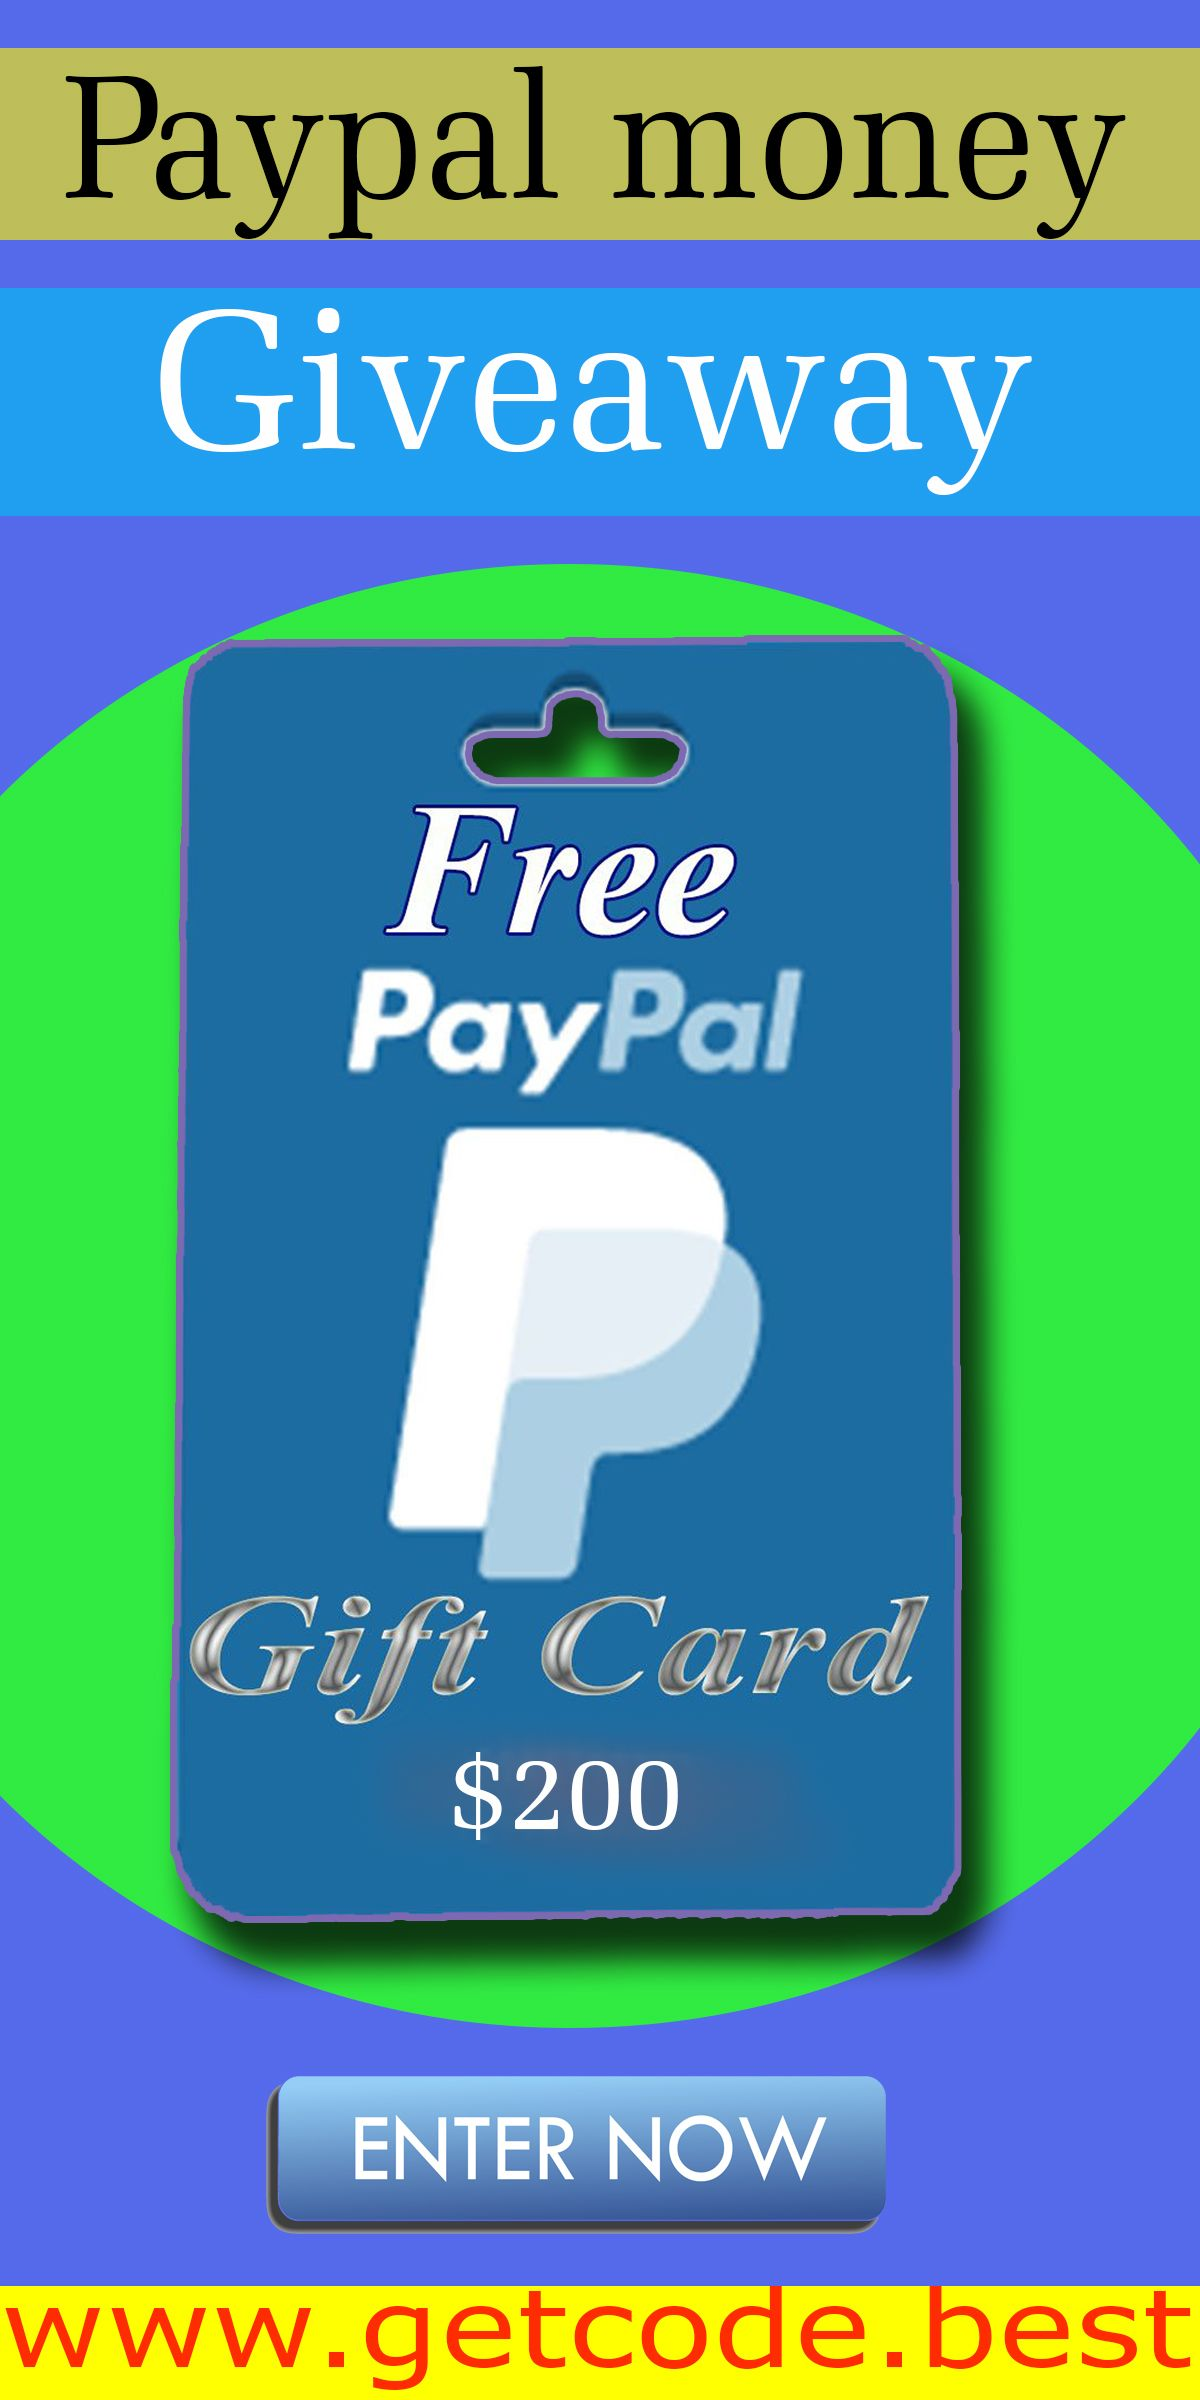 Free Paypal Gift Card Unused Codes Generator 2020 Paypalgiftcard